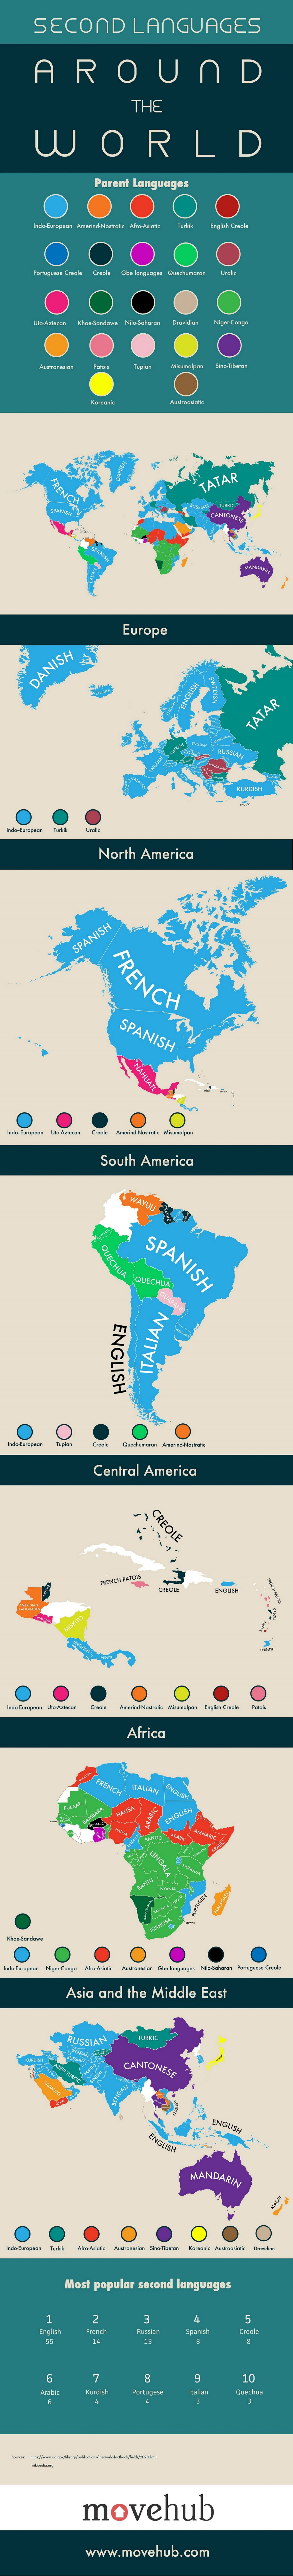 second-languages-map-021114